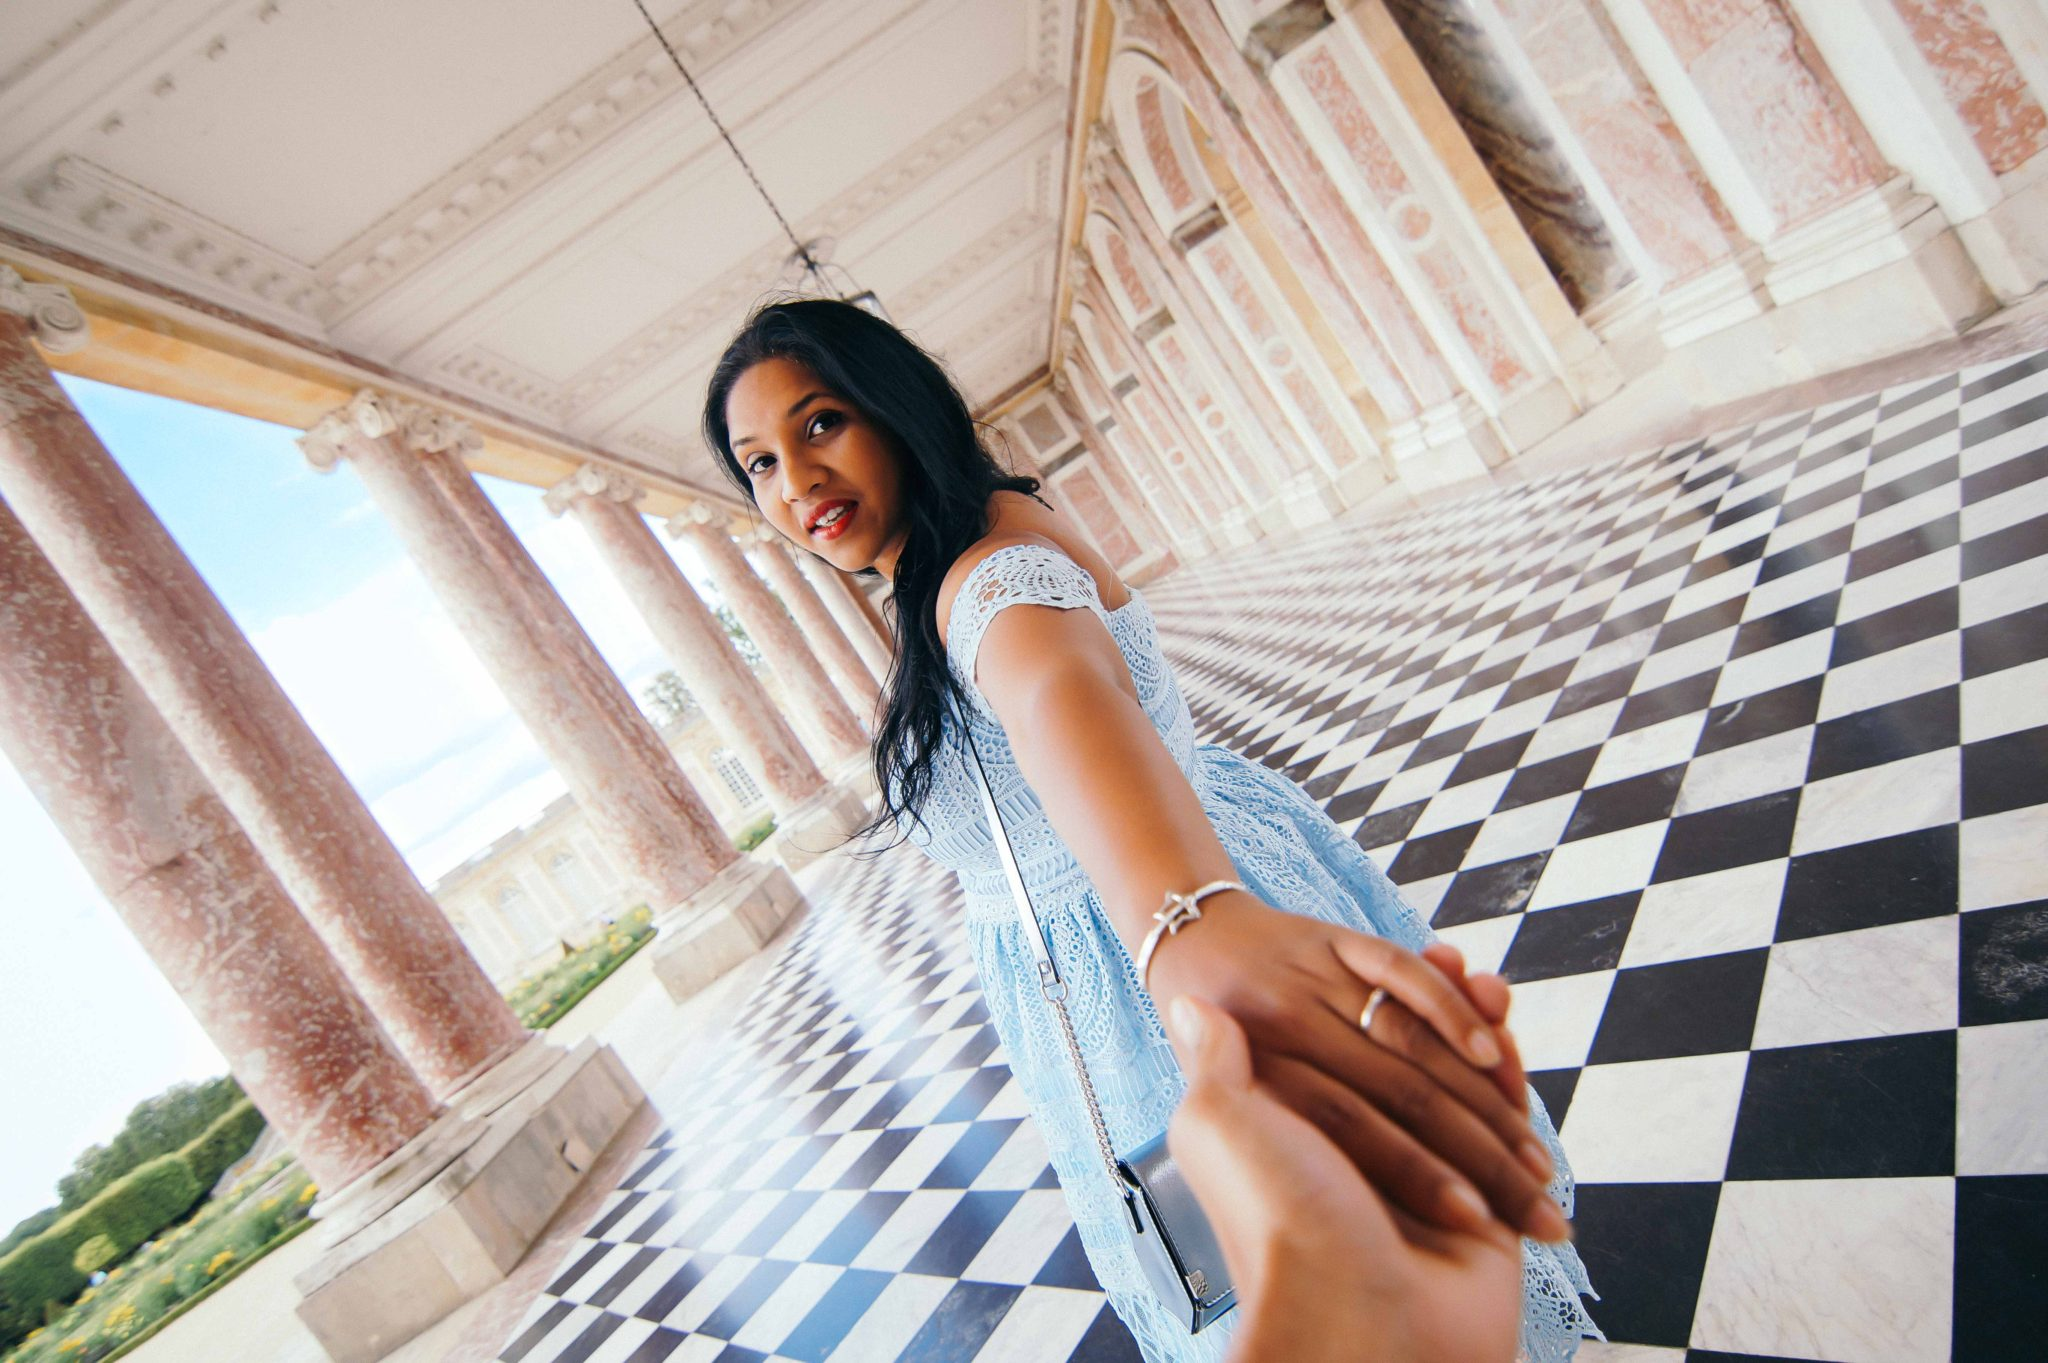 Take me to Trianon at Versailles